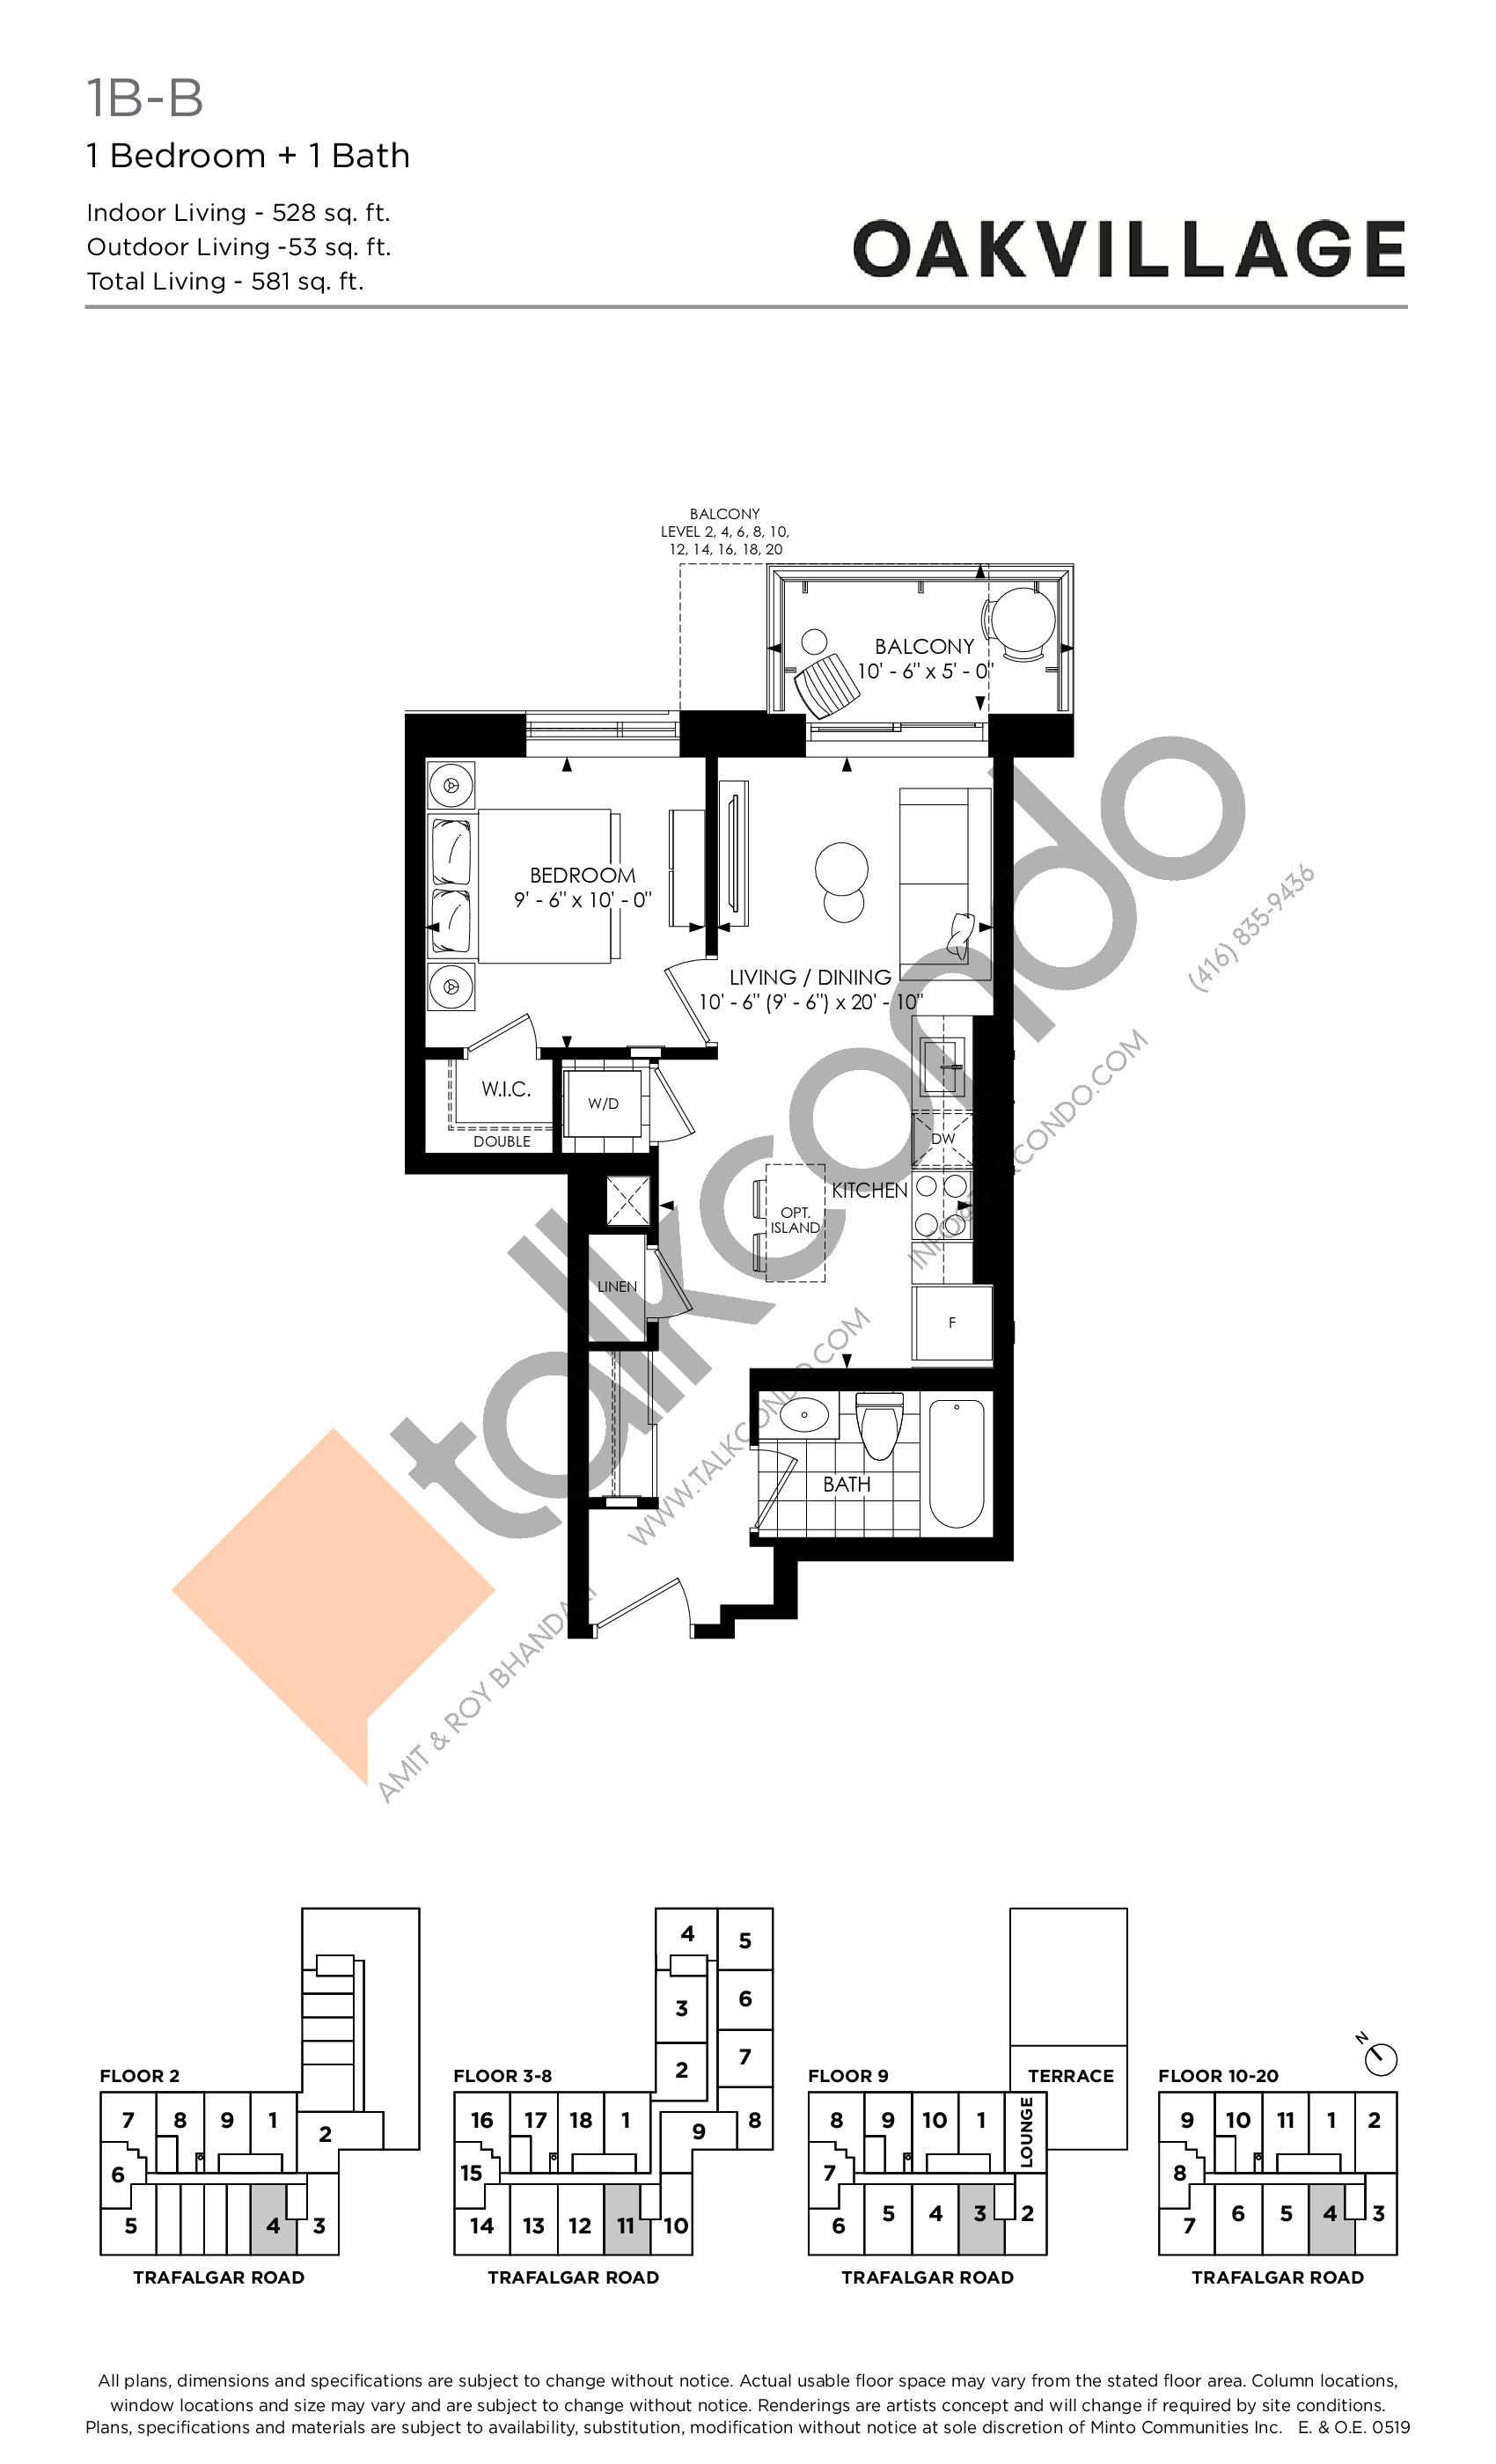 1B-B (Tower) Floor Plan at Oakvillage Phase 2 - 528 sq.ft